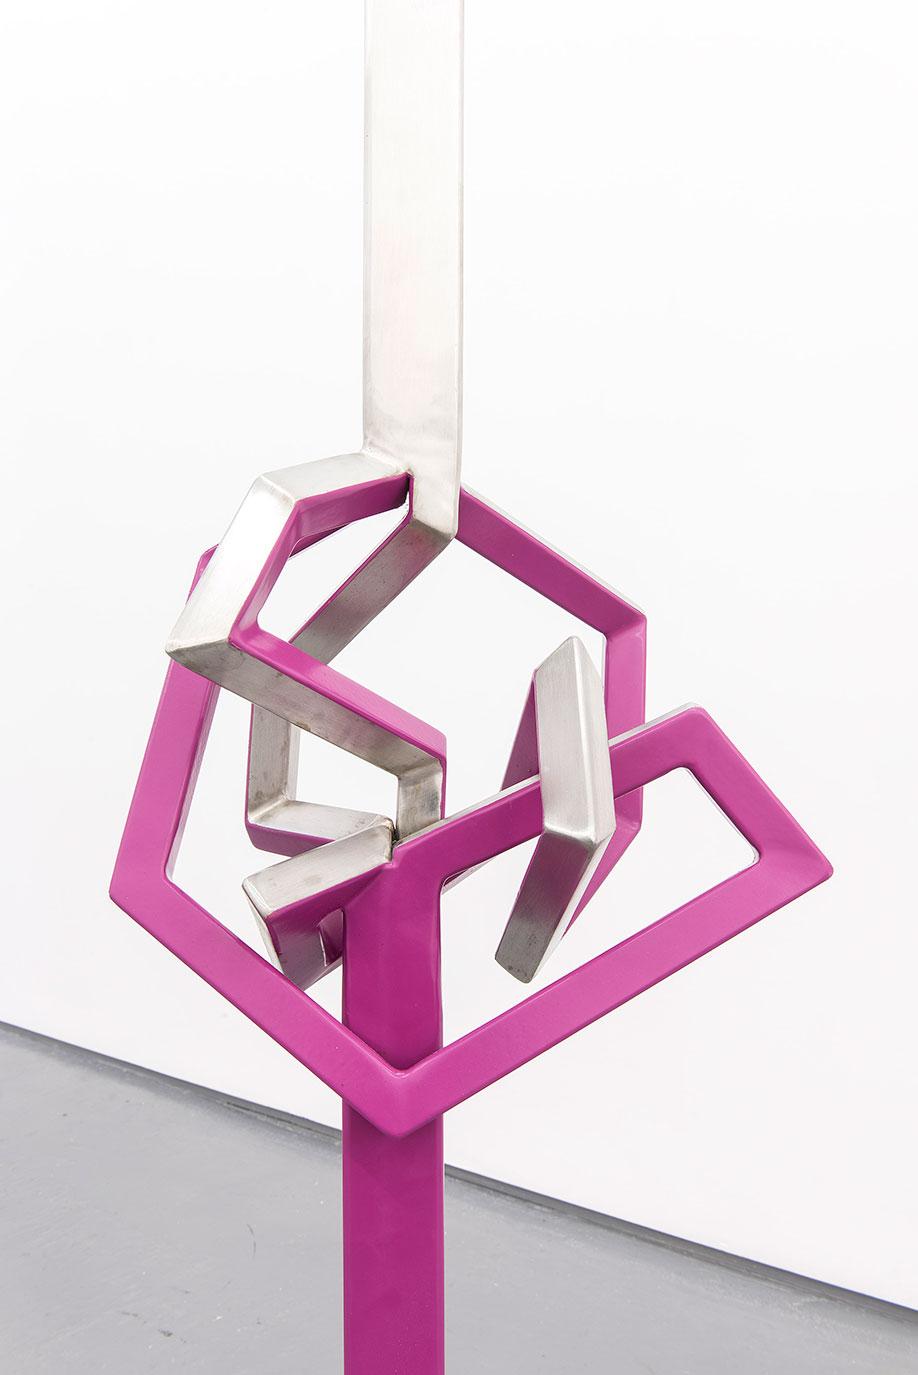 <b>Title:</b>Himalayan Balsam<br /><b>Year:</b>2013<br /><b>Medium:</b>Powder-coated stainless steel<br /><b>Size:</b>145 x 27 x 18 cm